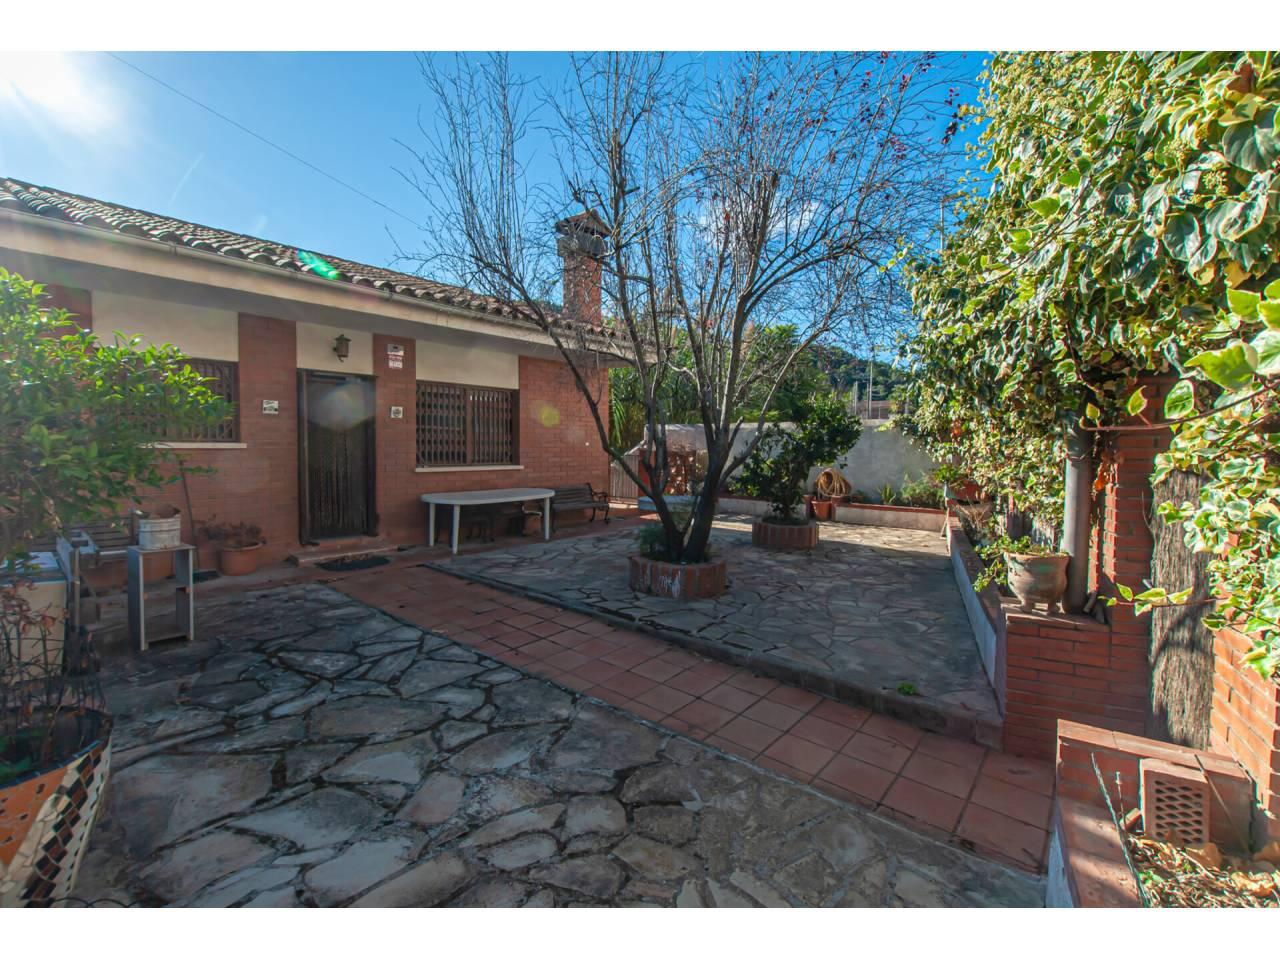 Casa en venta en Vallirana